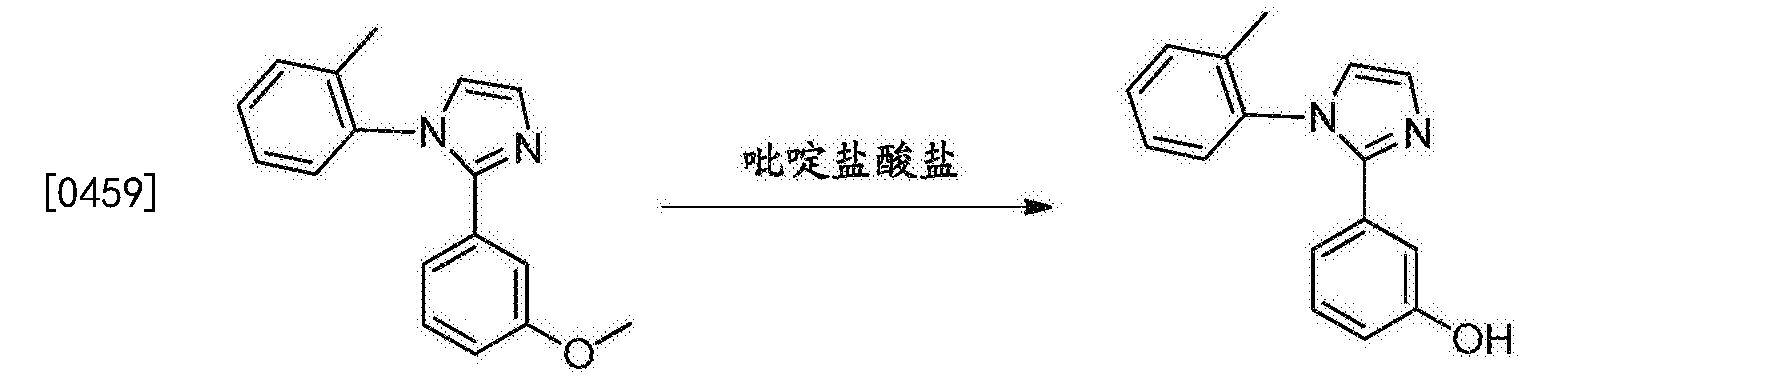 Figure CN106749425AD01452